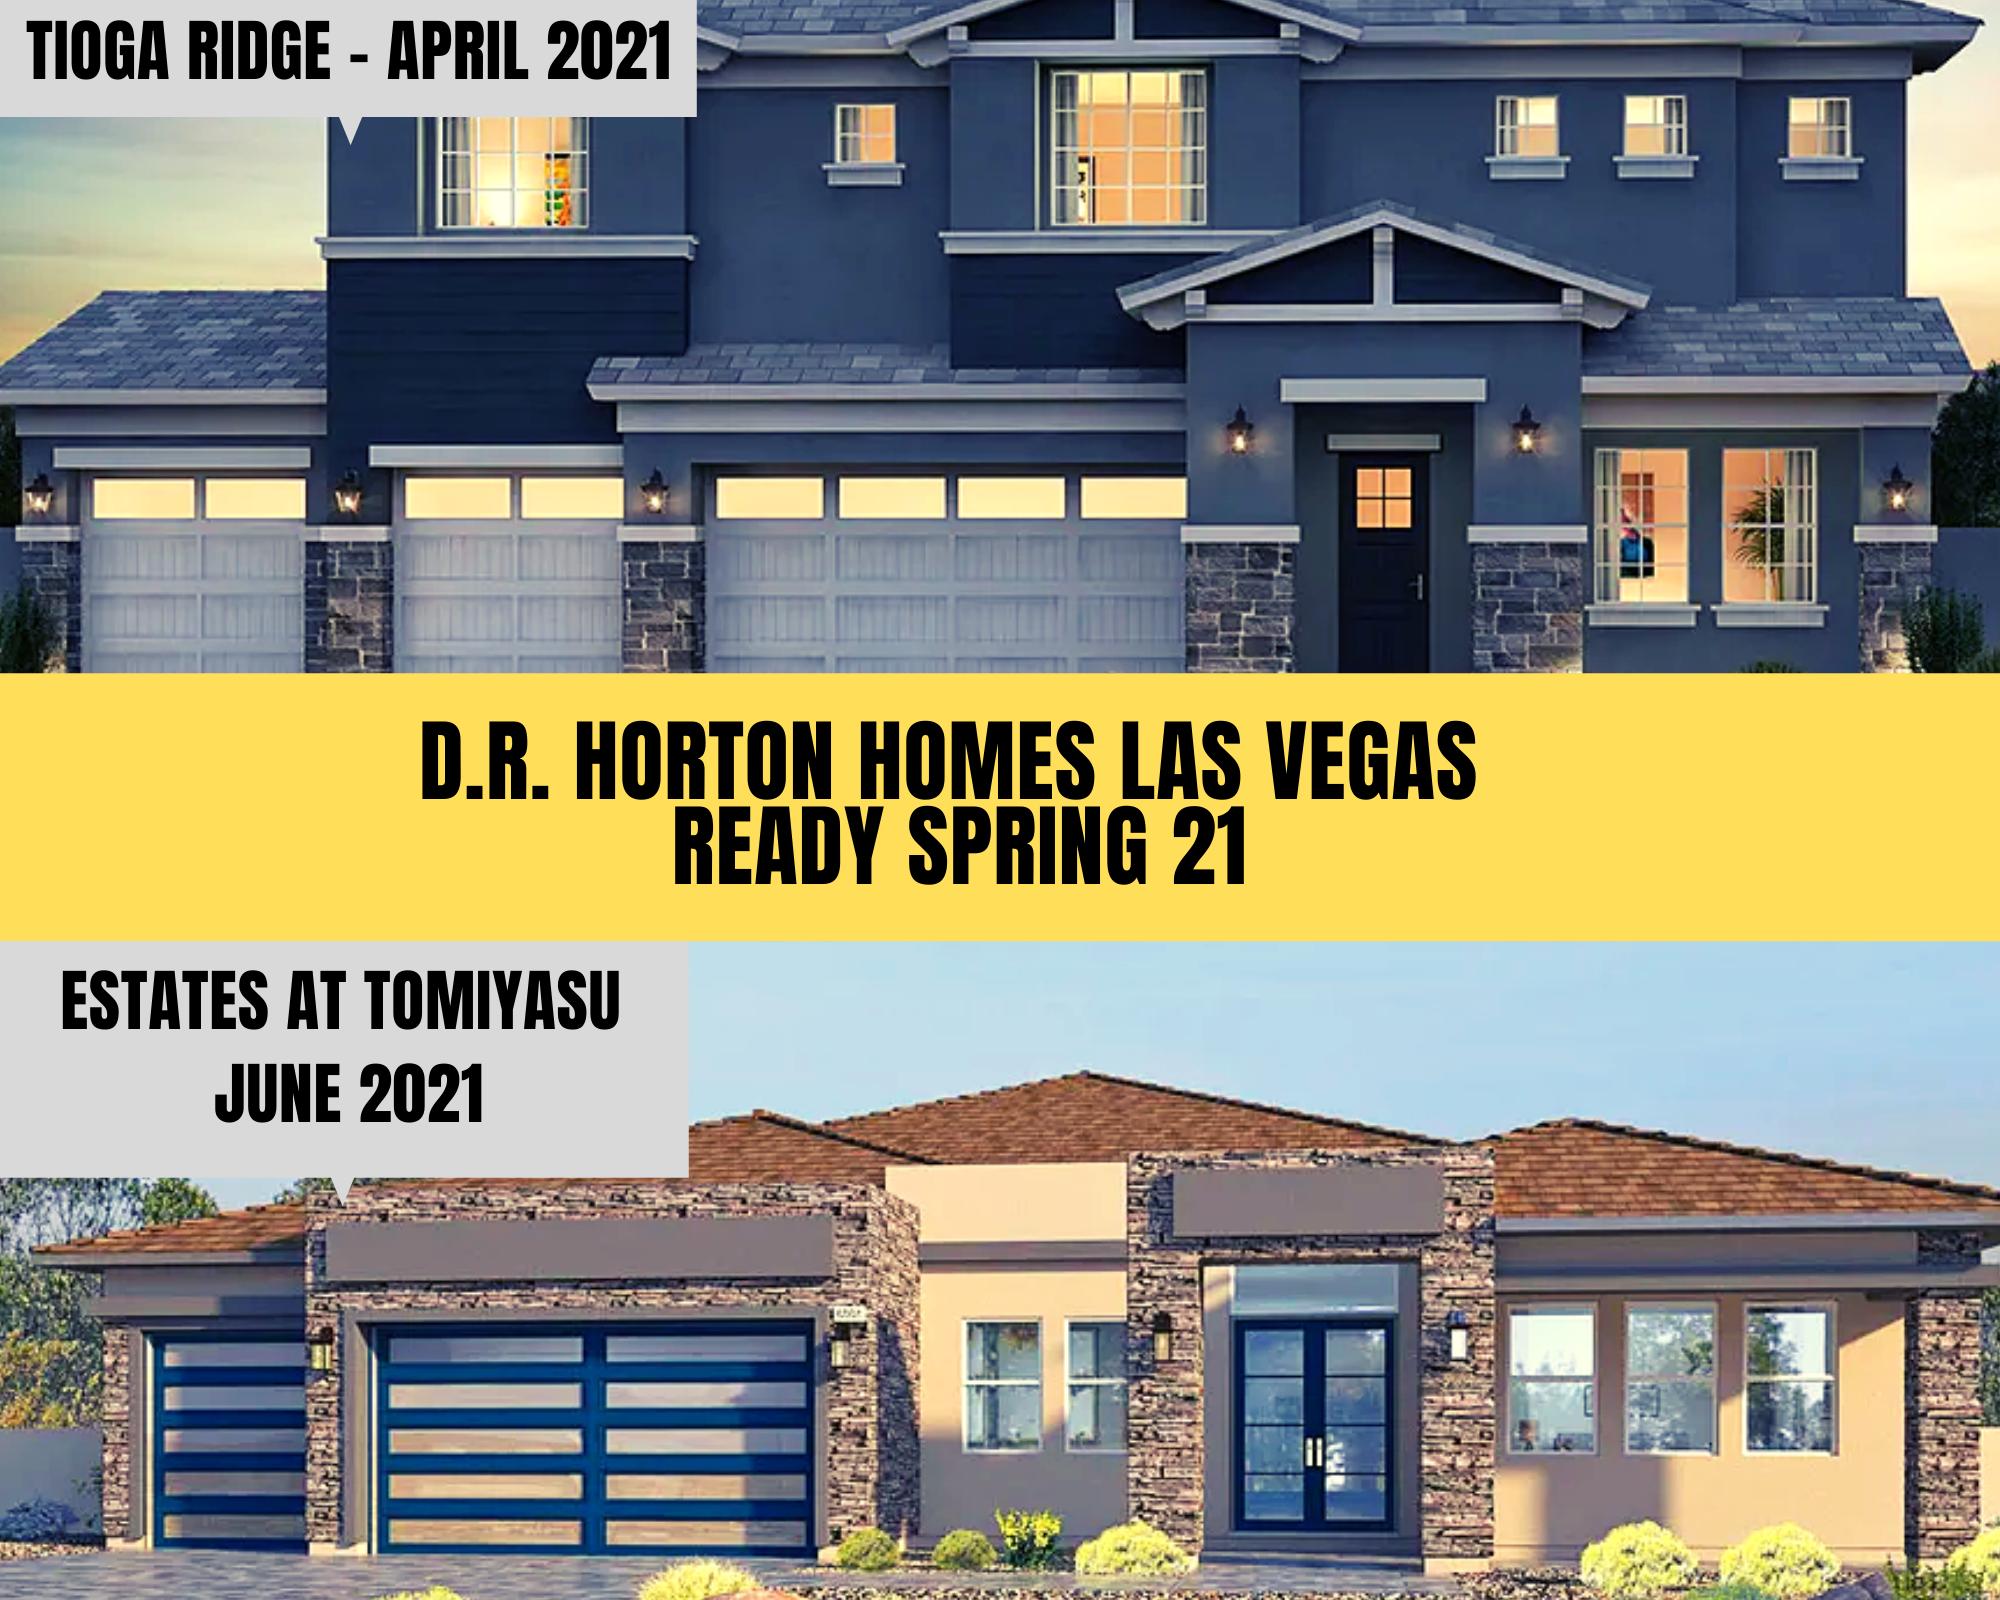 D.R. Horton homes Las Vegas ready spring 2021